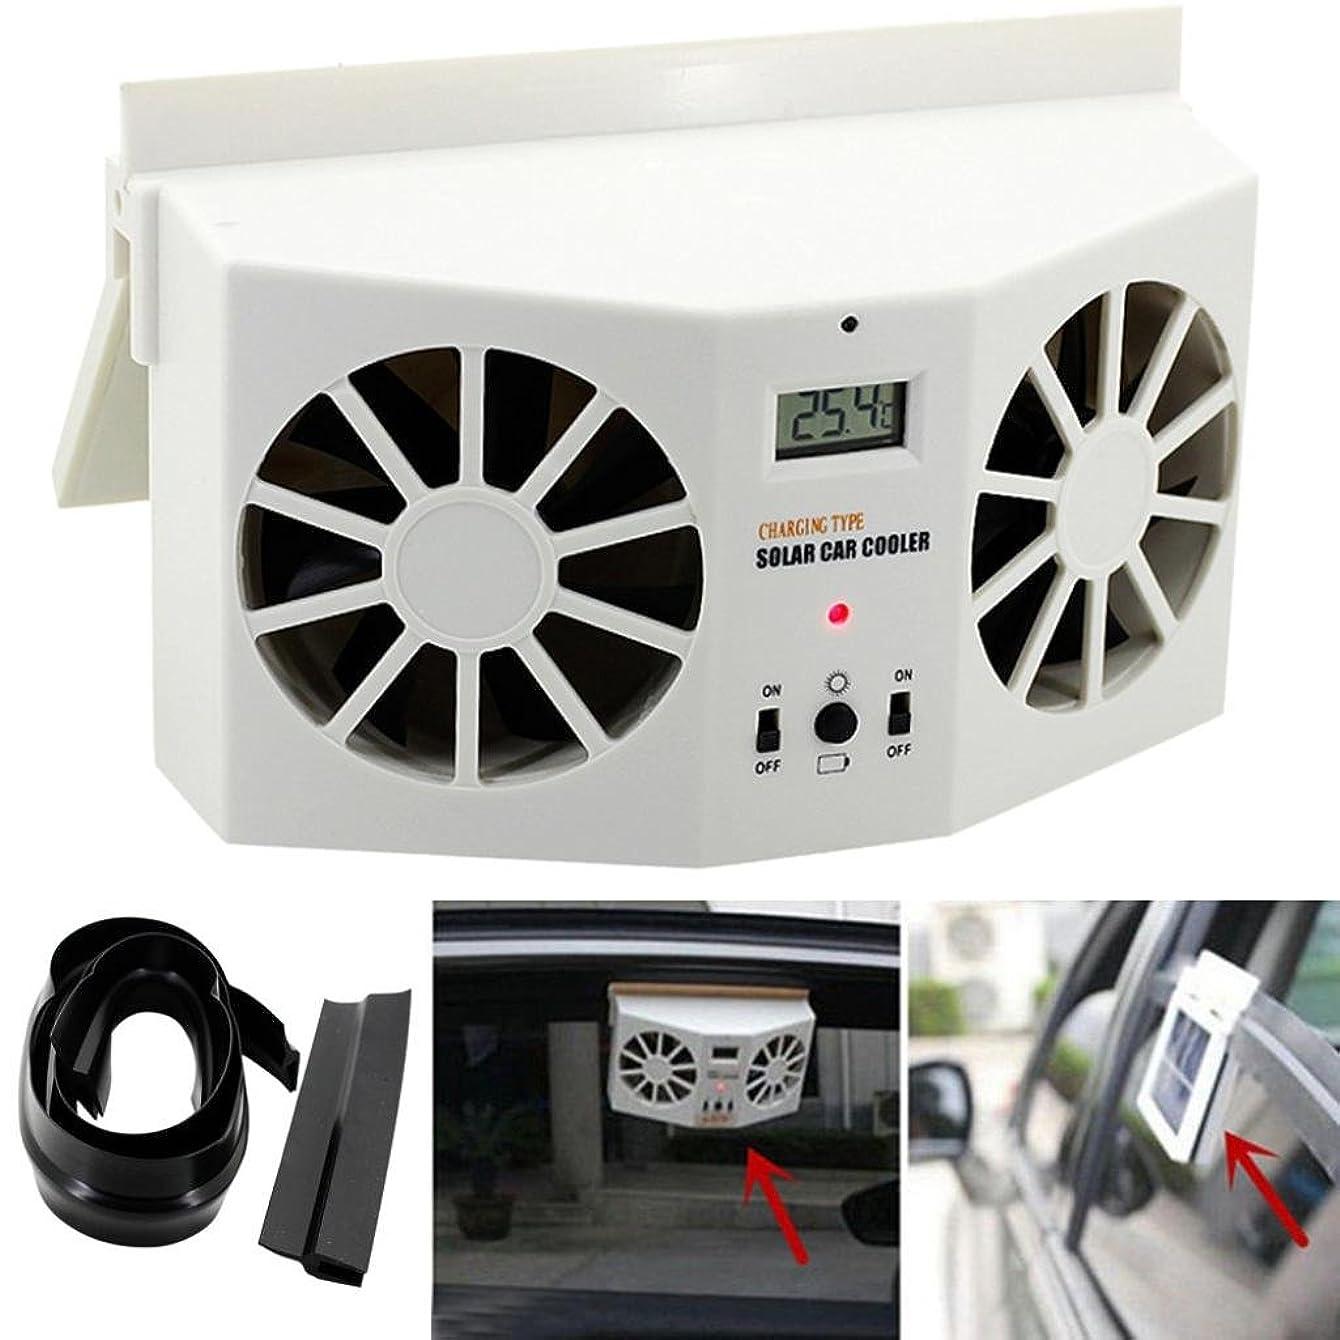 WensLTD 2017 HOT NEW Solar Powered Car Window Air Vent Ventilator Mini Air Conditioner Cool Fan (White)